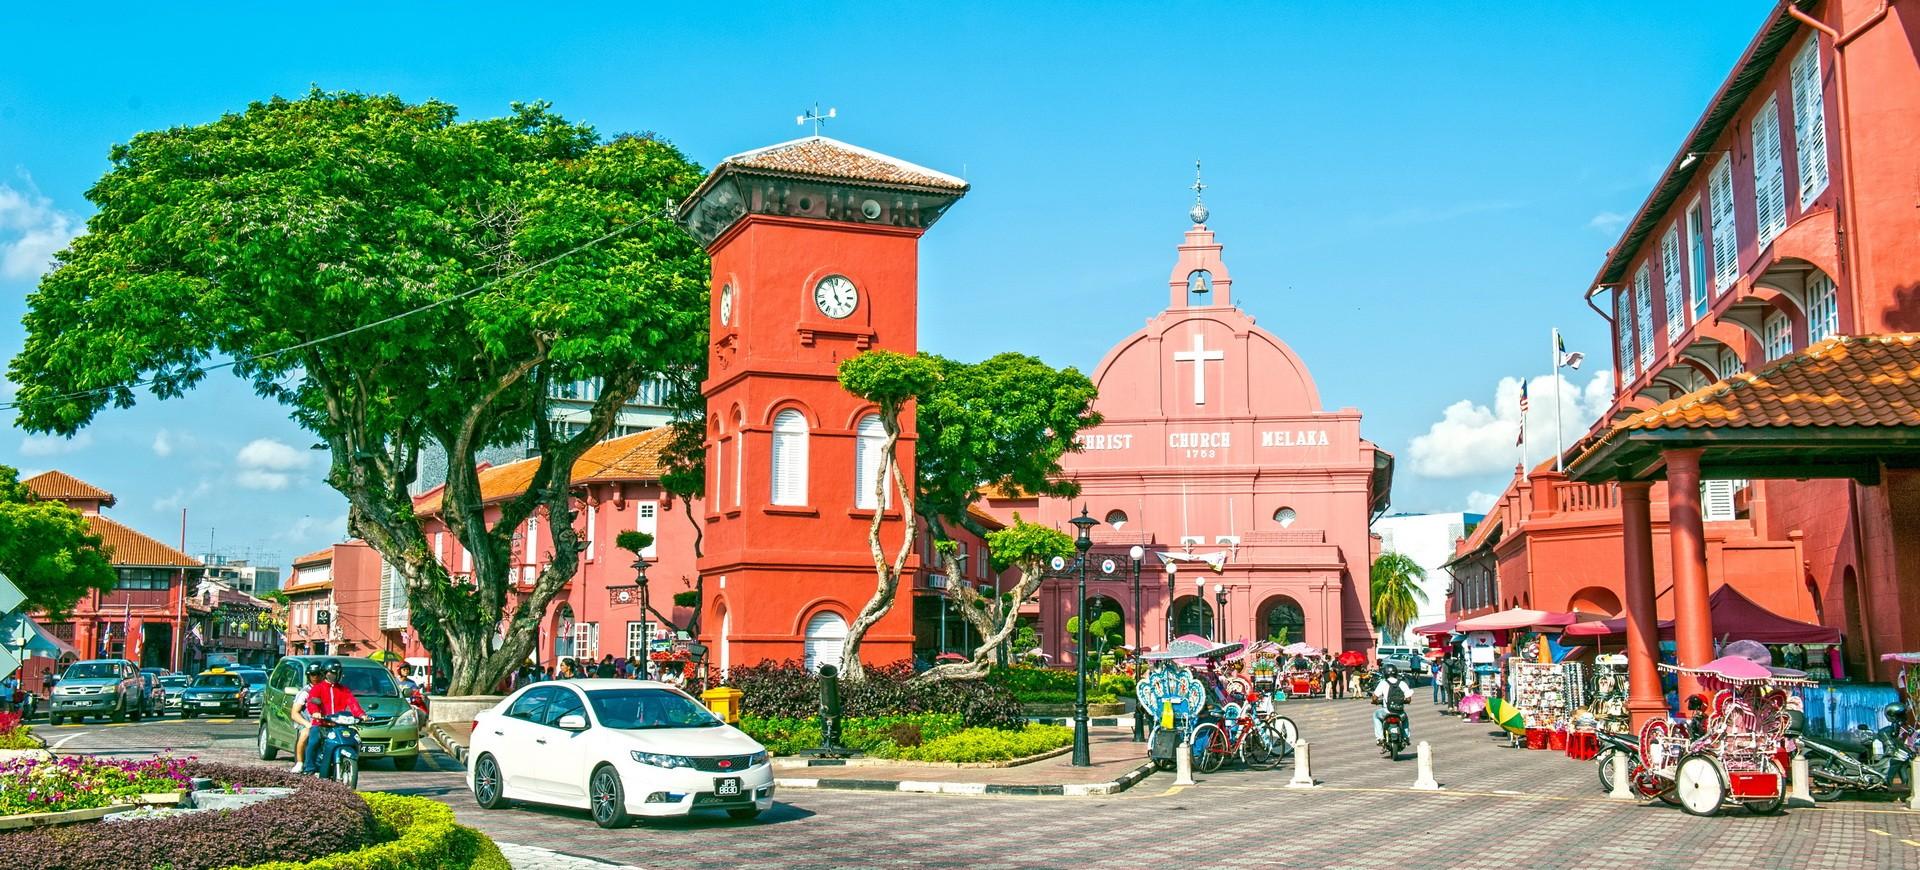 Malaisie Melacca Eglise Stadhuys